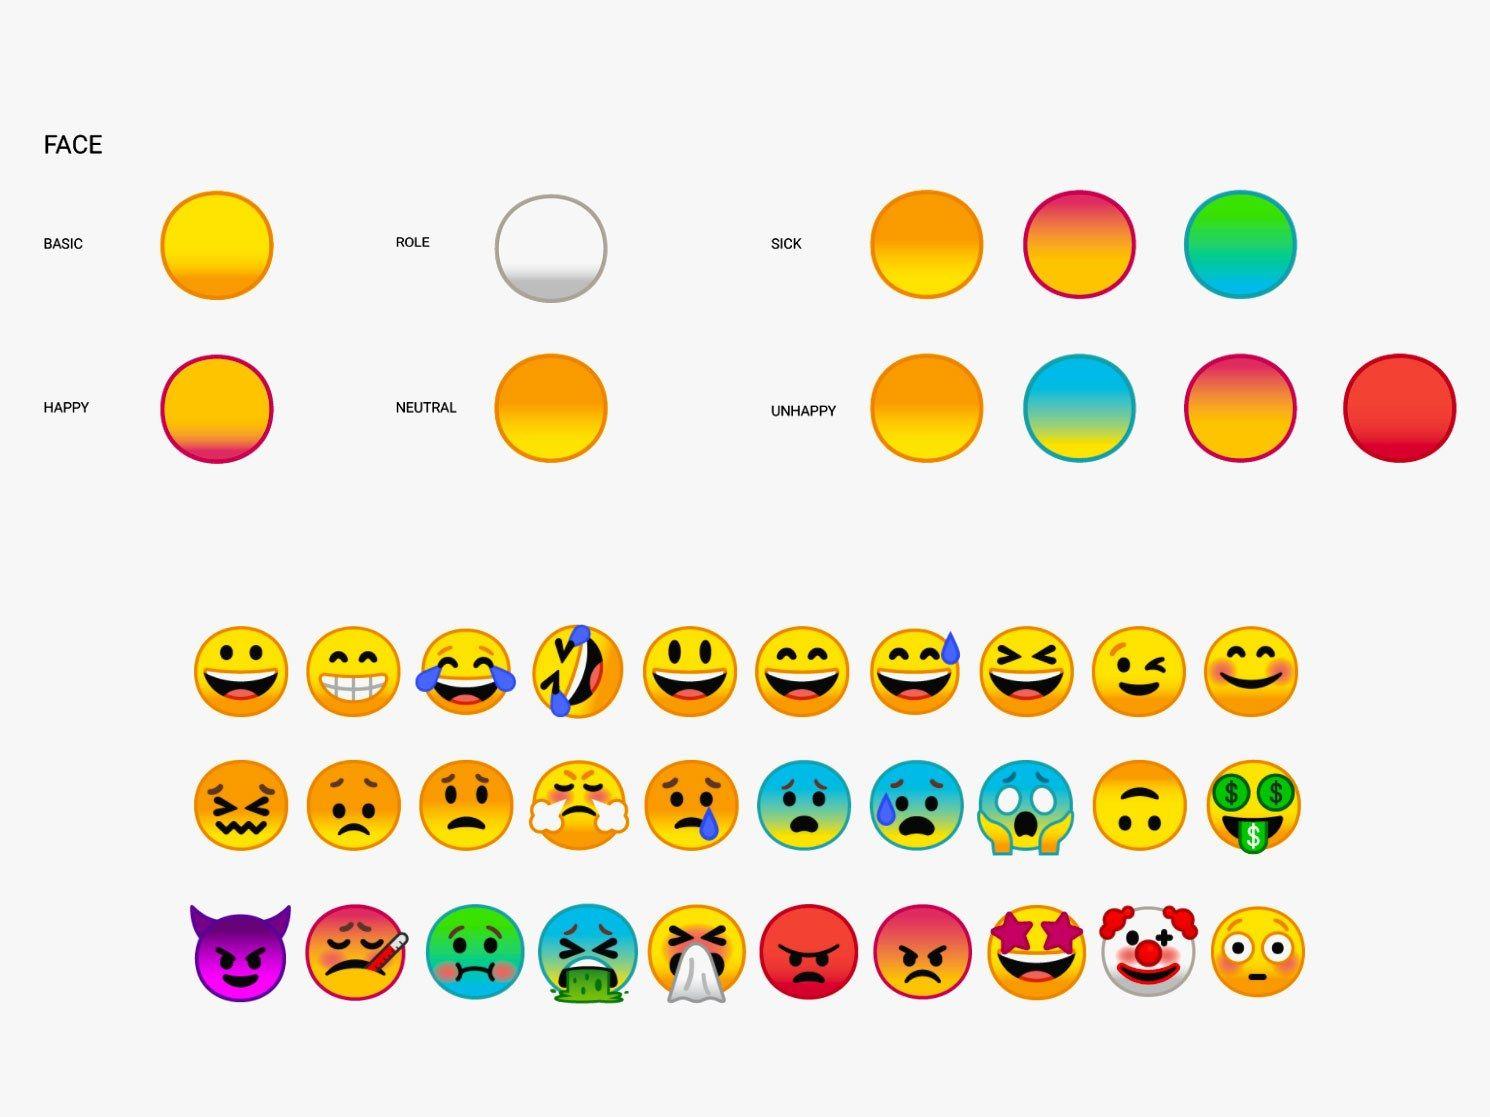 Say Goodbye To The Blob Google S New Emoji Have Arrived Google Emoji Android Emoji Emoji